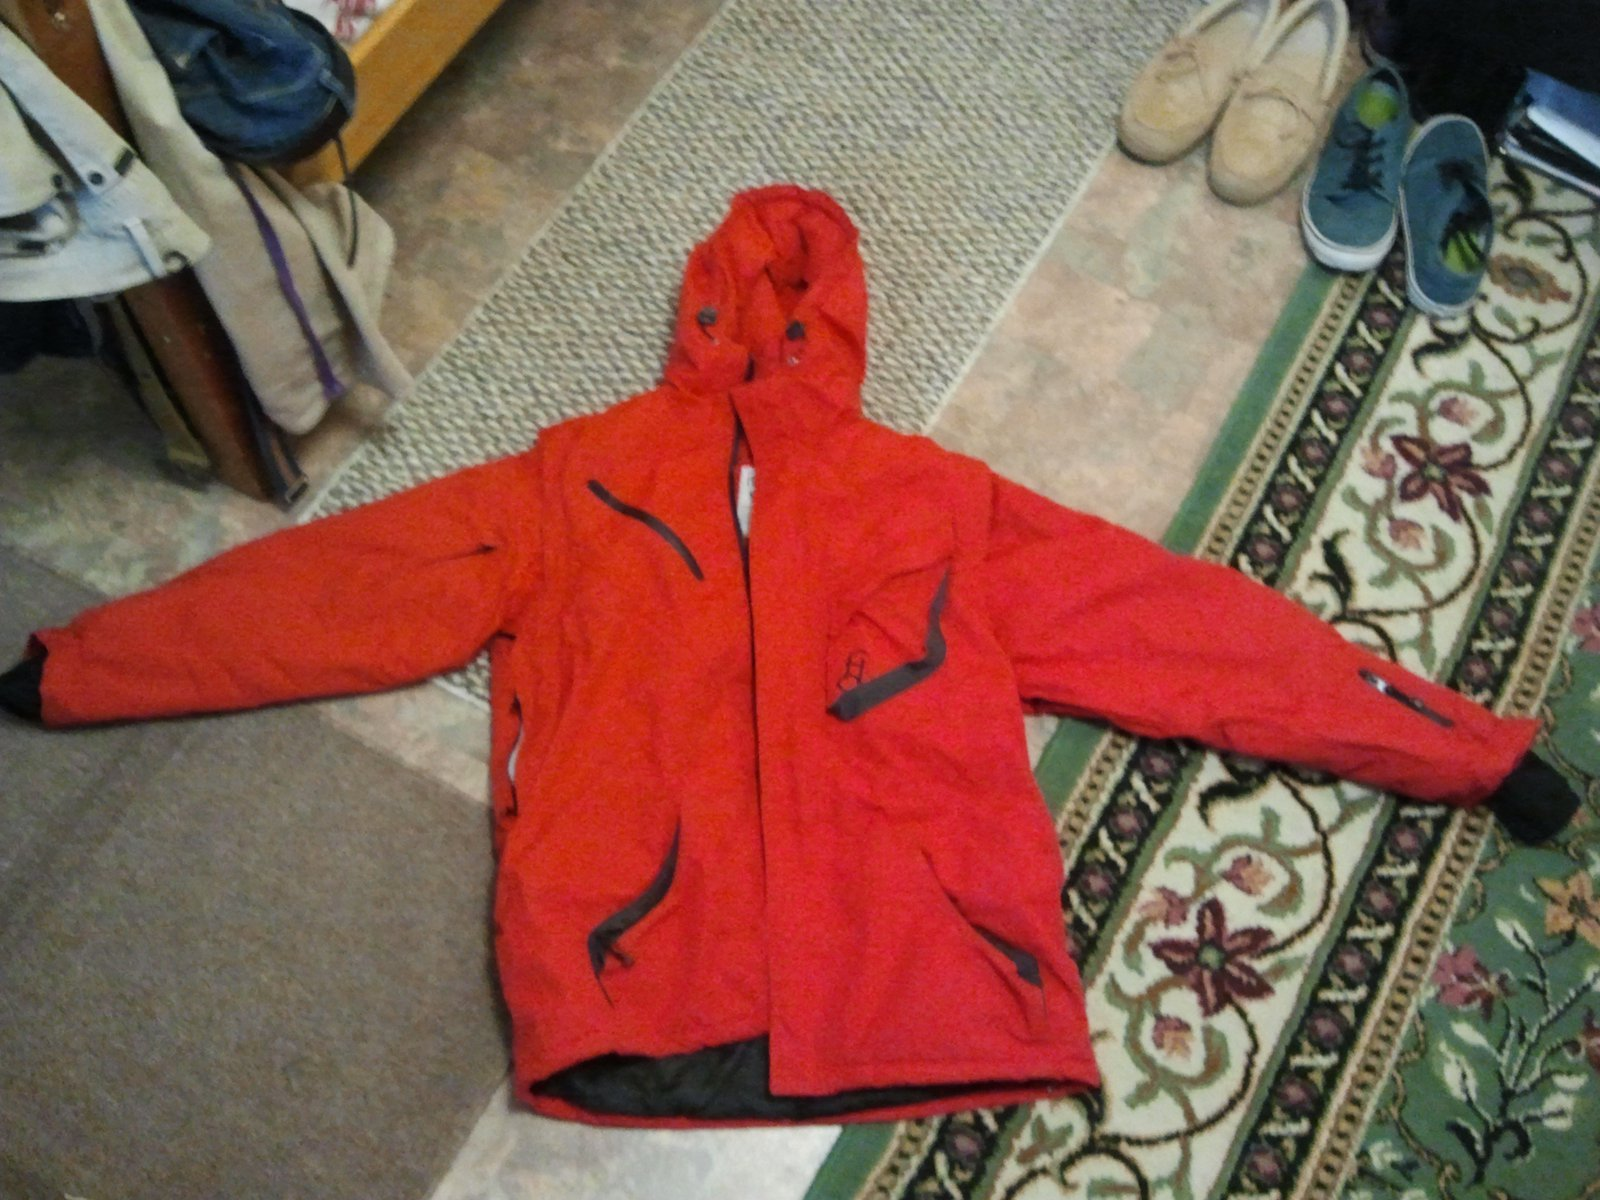 FD jacket w/ sleeves